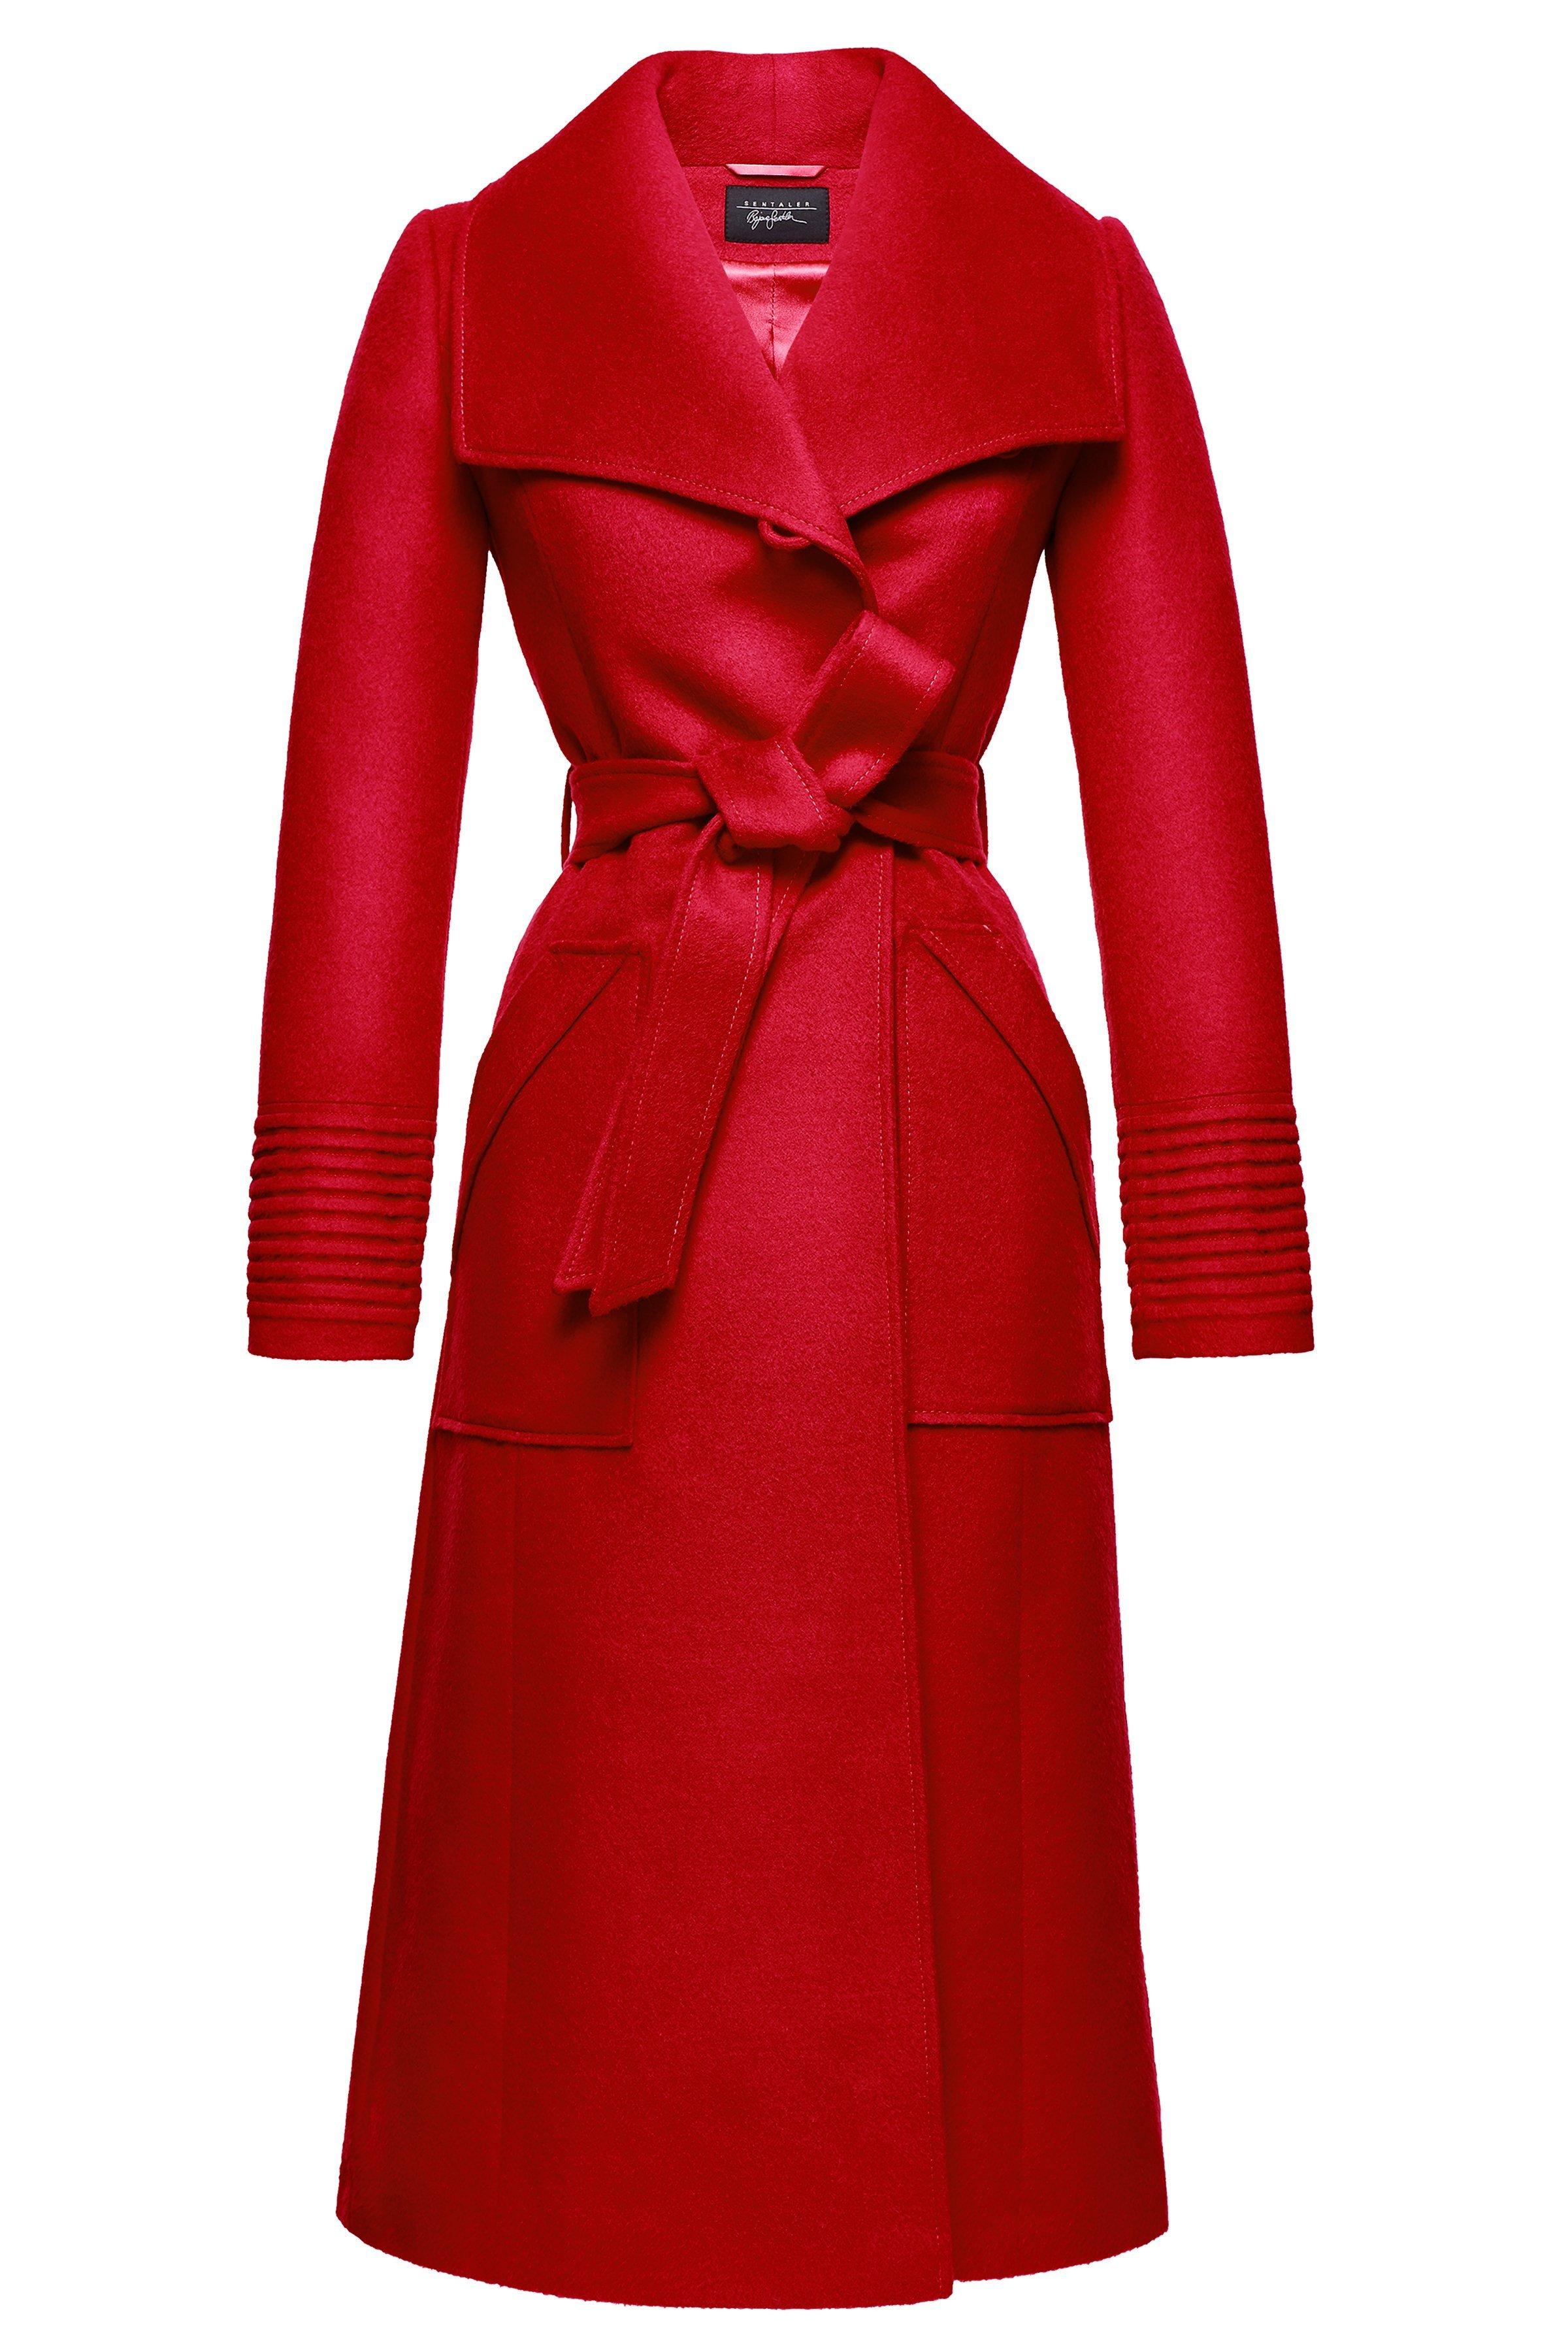 NEW Long Wide Collar Wrap Coat, Red – SENTALER